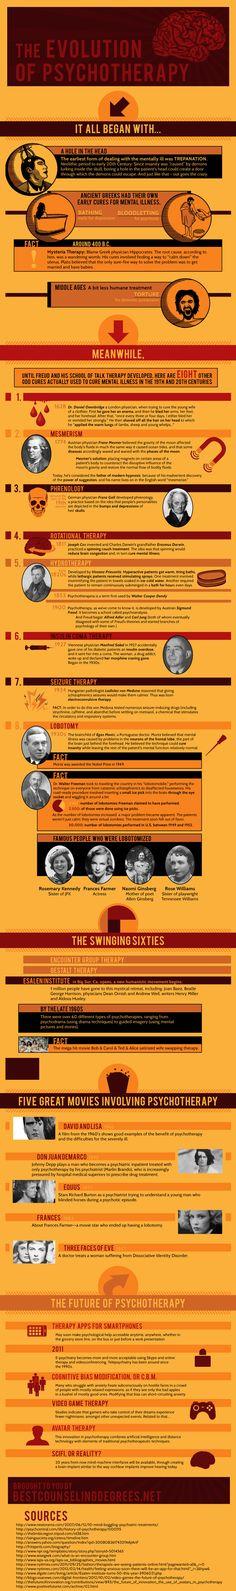 History of psychology